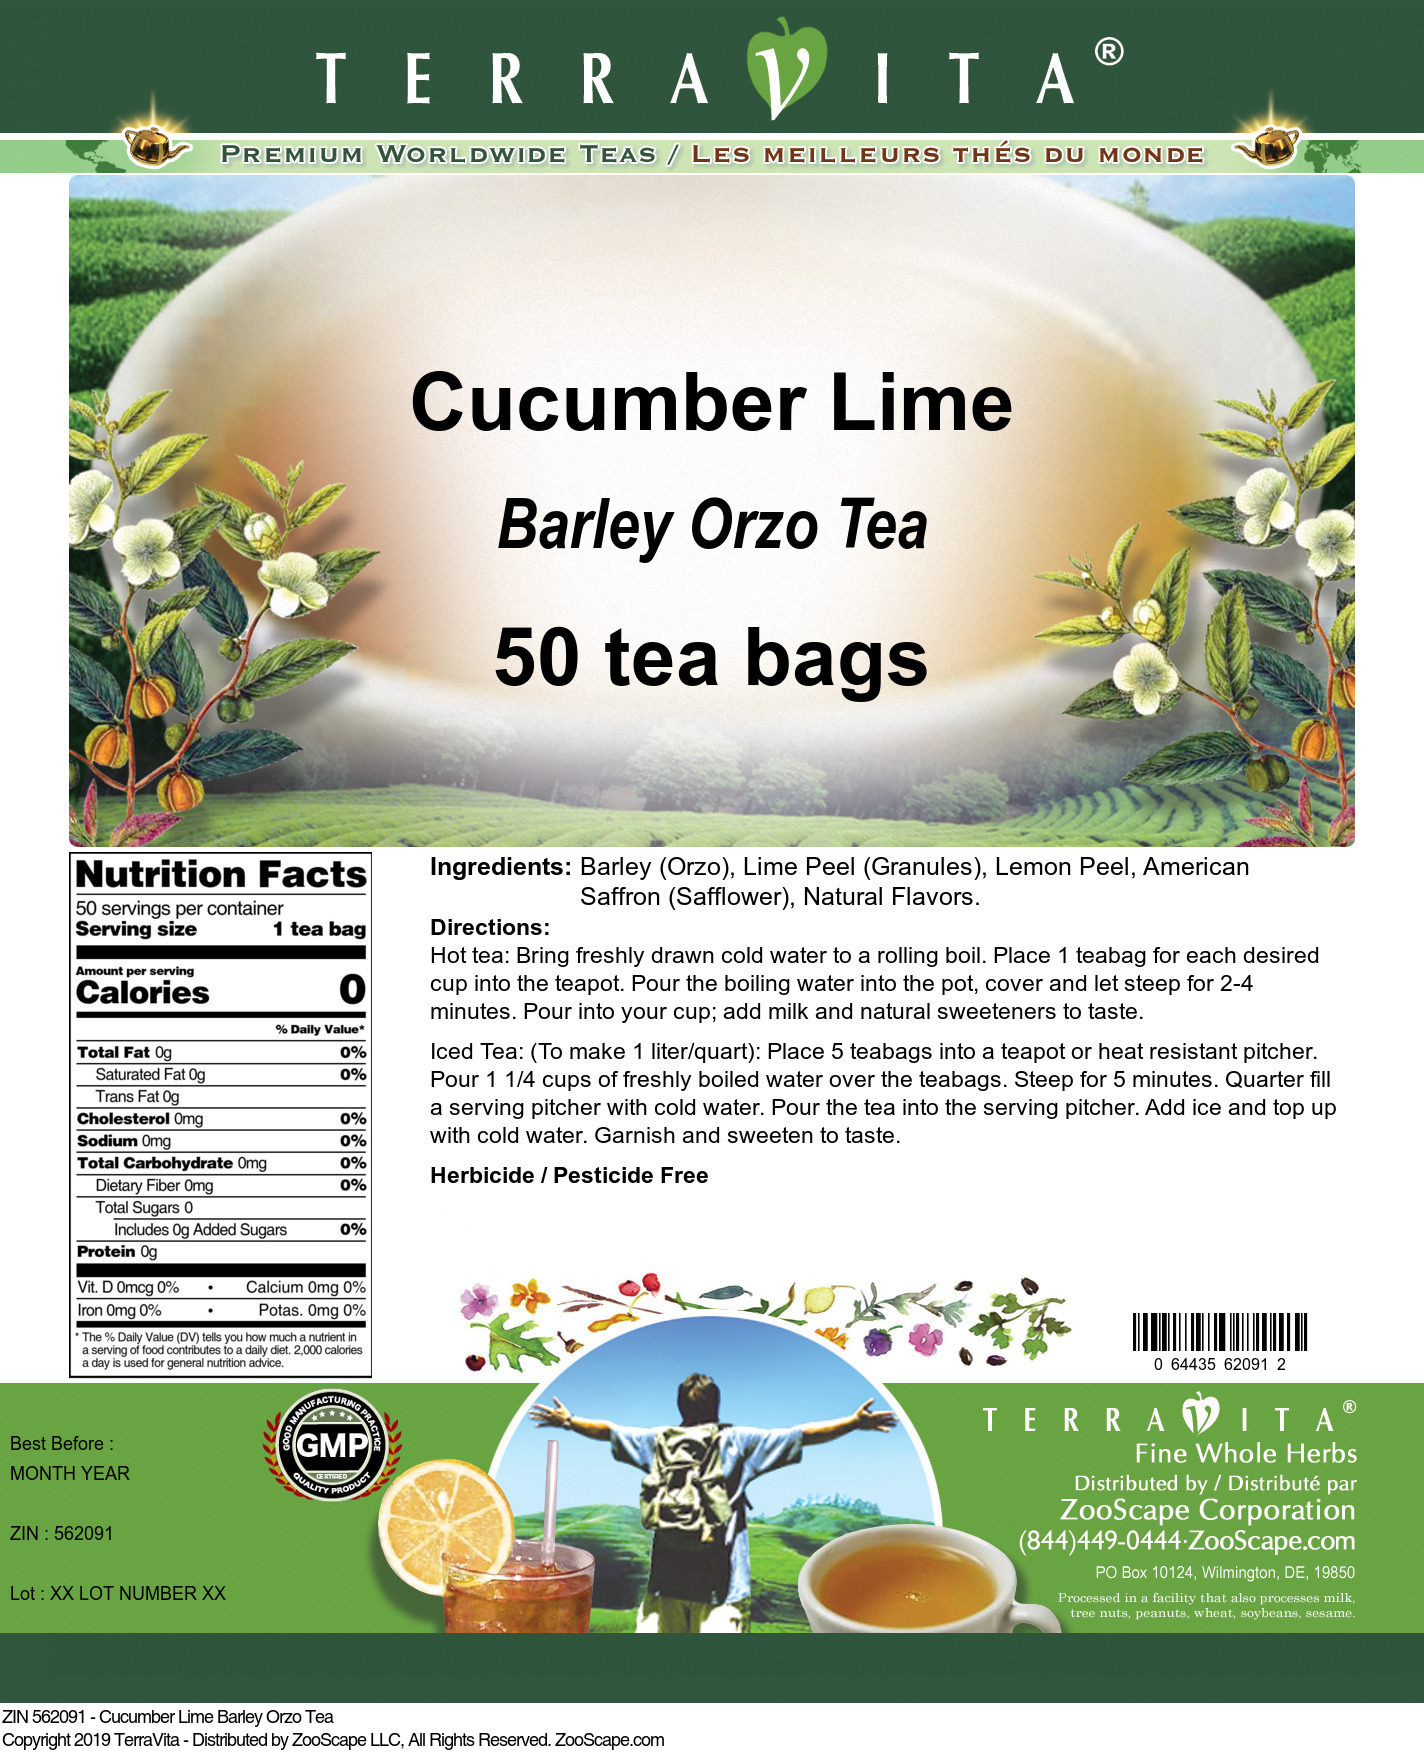 Cucumber Lime Barley Orzo